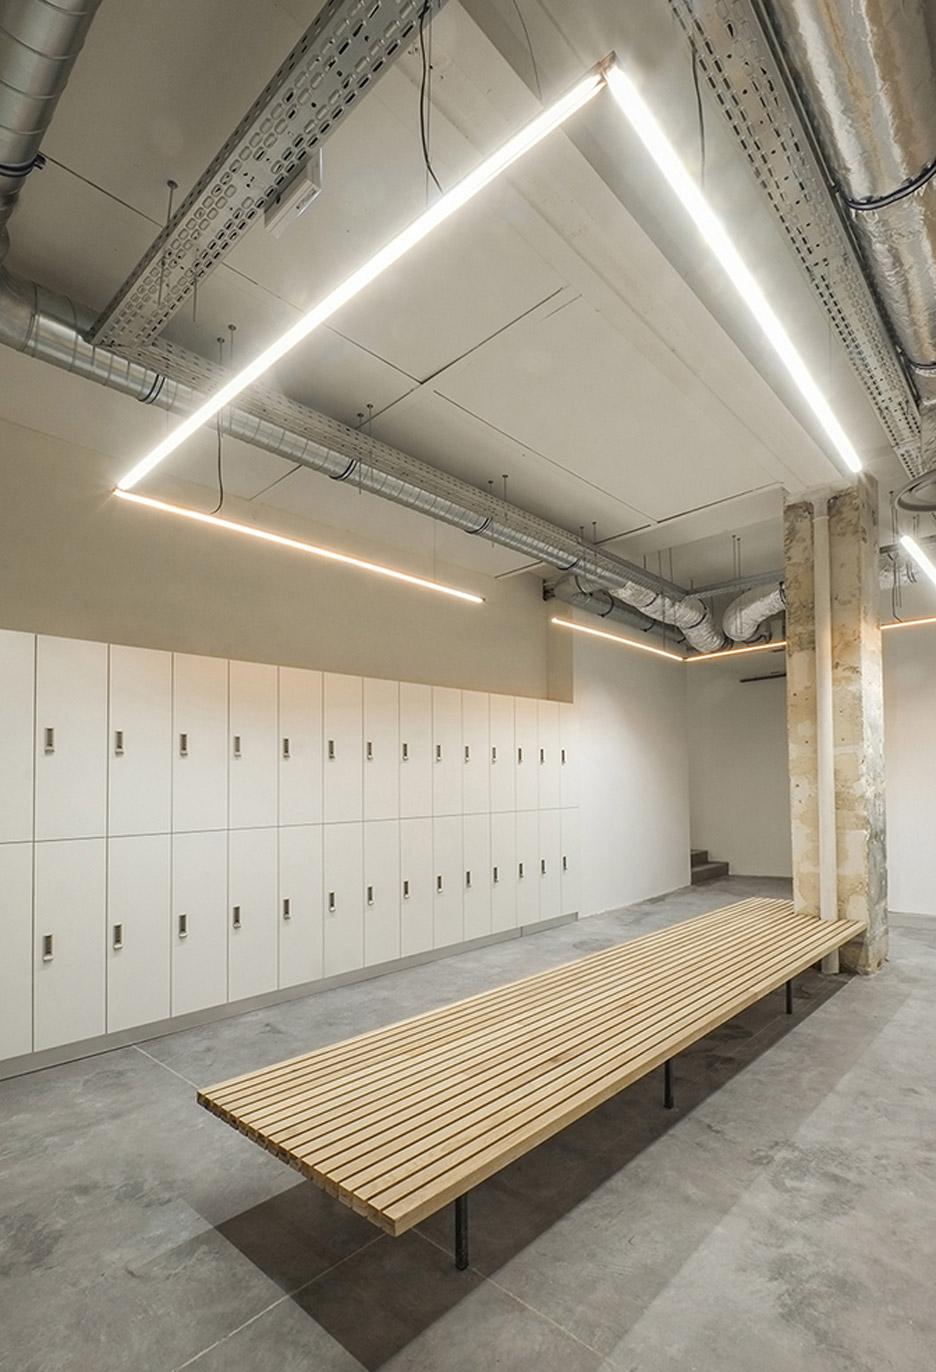 Architecture-paris-sport-club-design-studia-interiors-osnovadesign-osnova-poltava-02